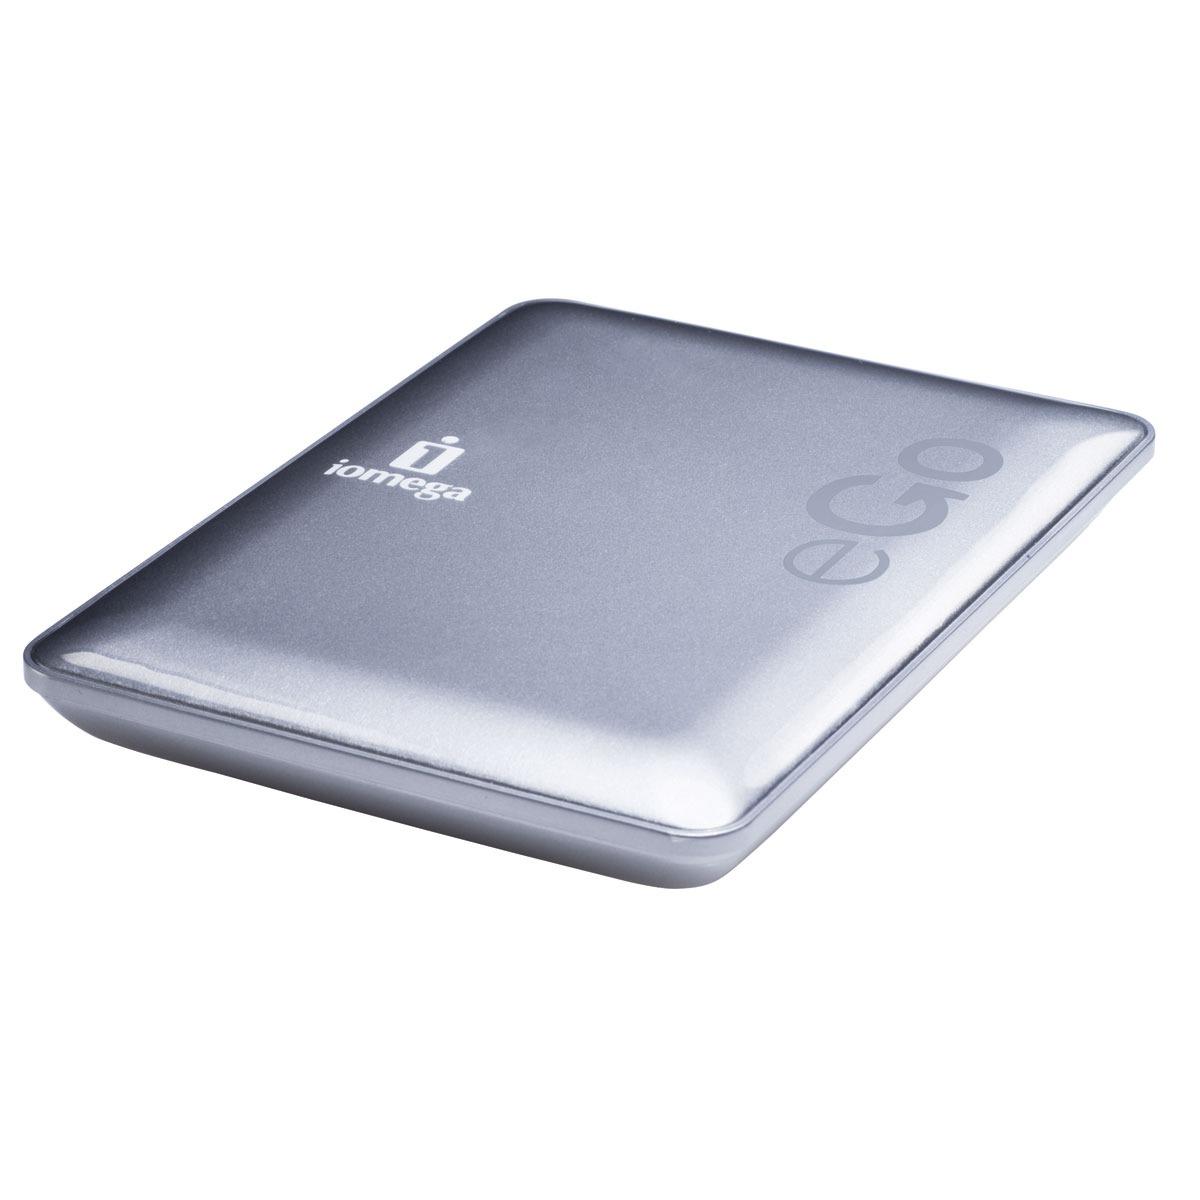 iomega ego compact portable hard drive 1 to disque dur. Black Bedroom Furniture Sets. Home Design Ideas